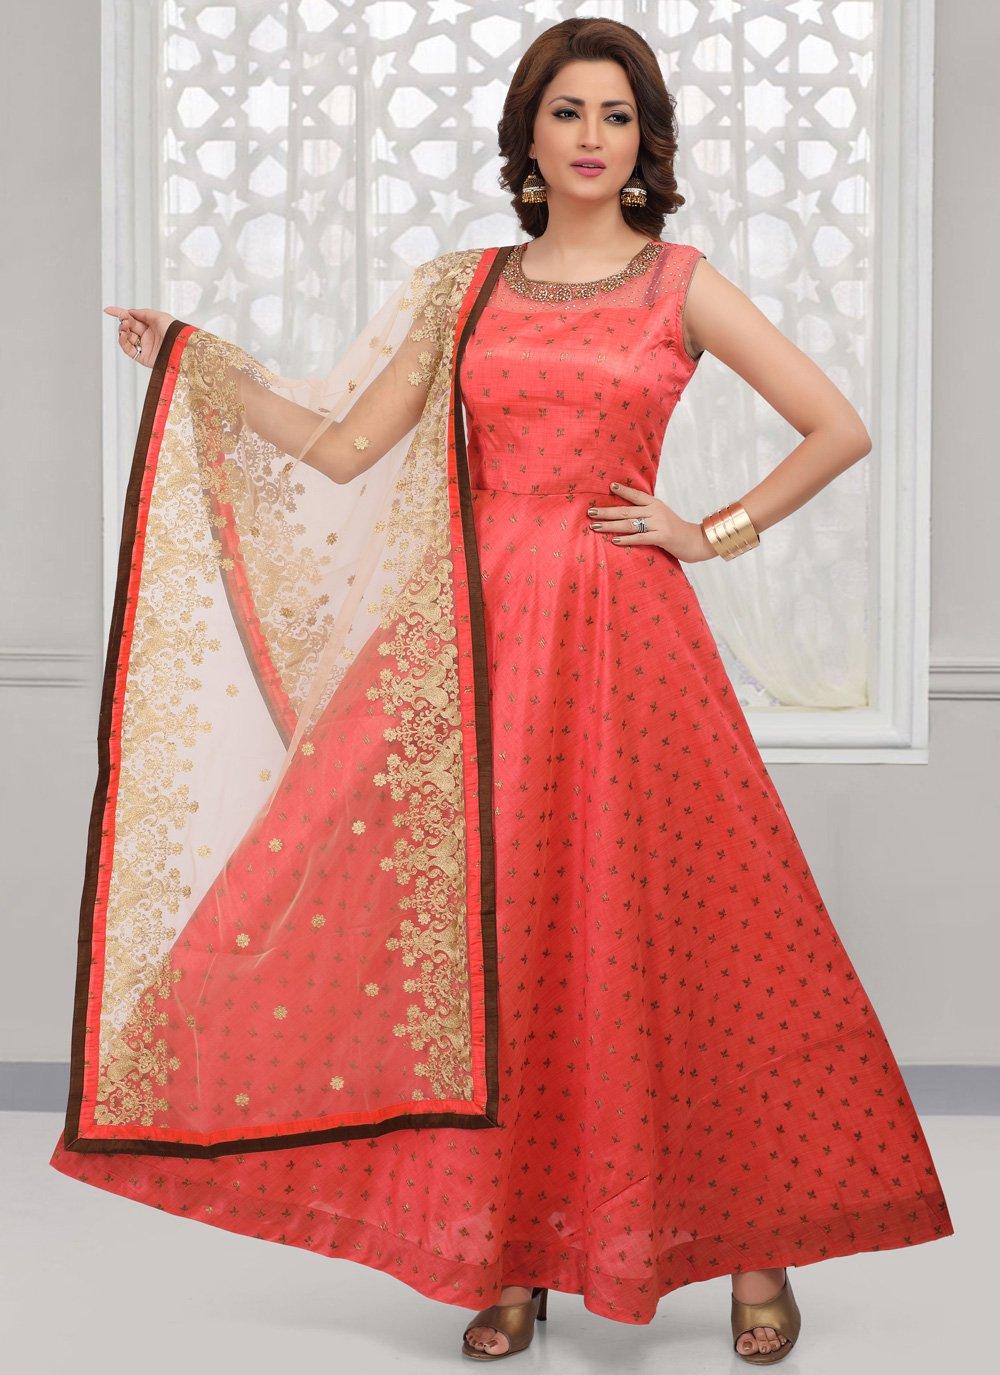 Art Silk Desinger Anarkali Salwar Suit in Red